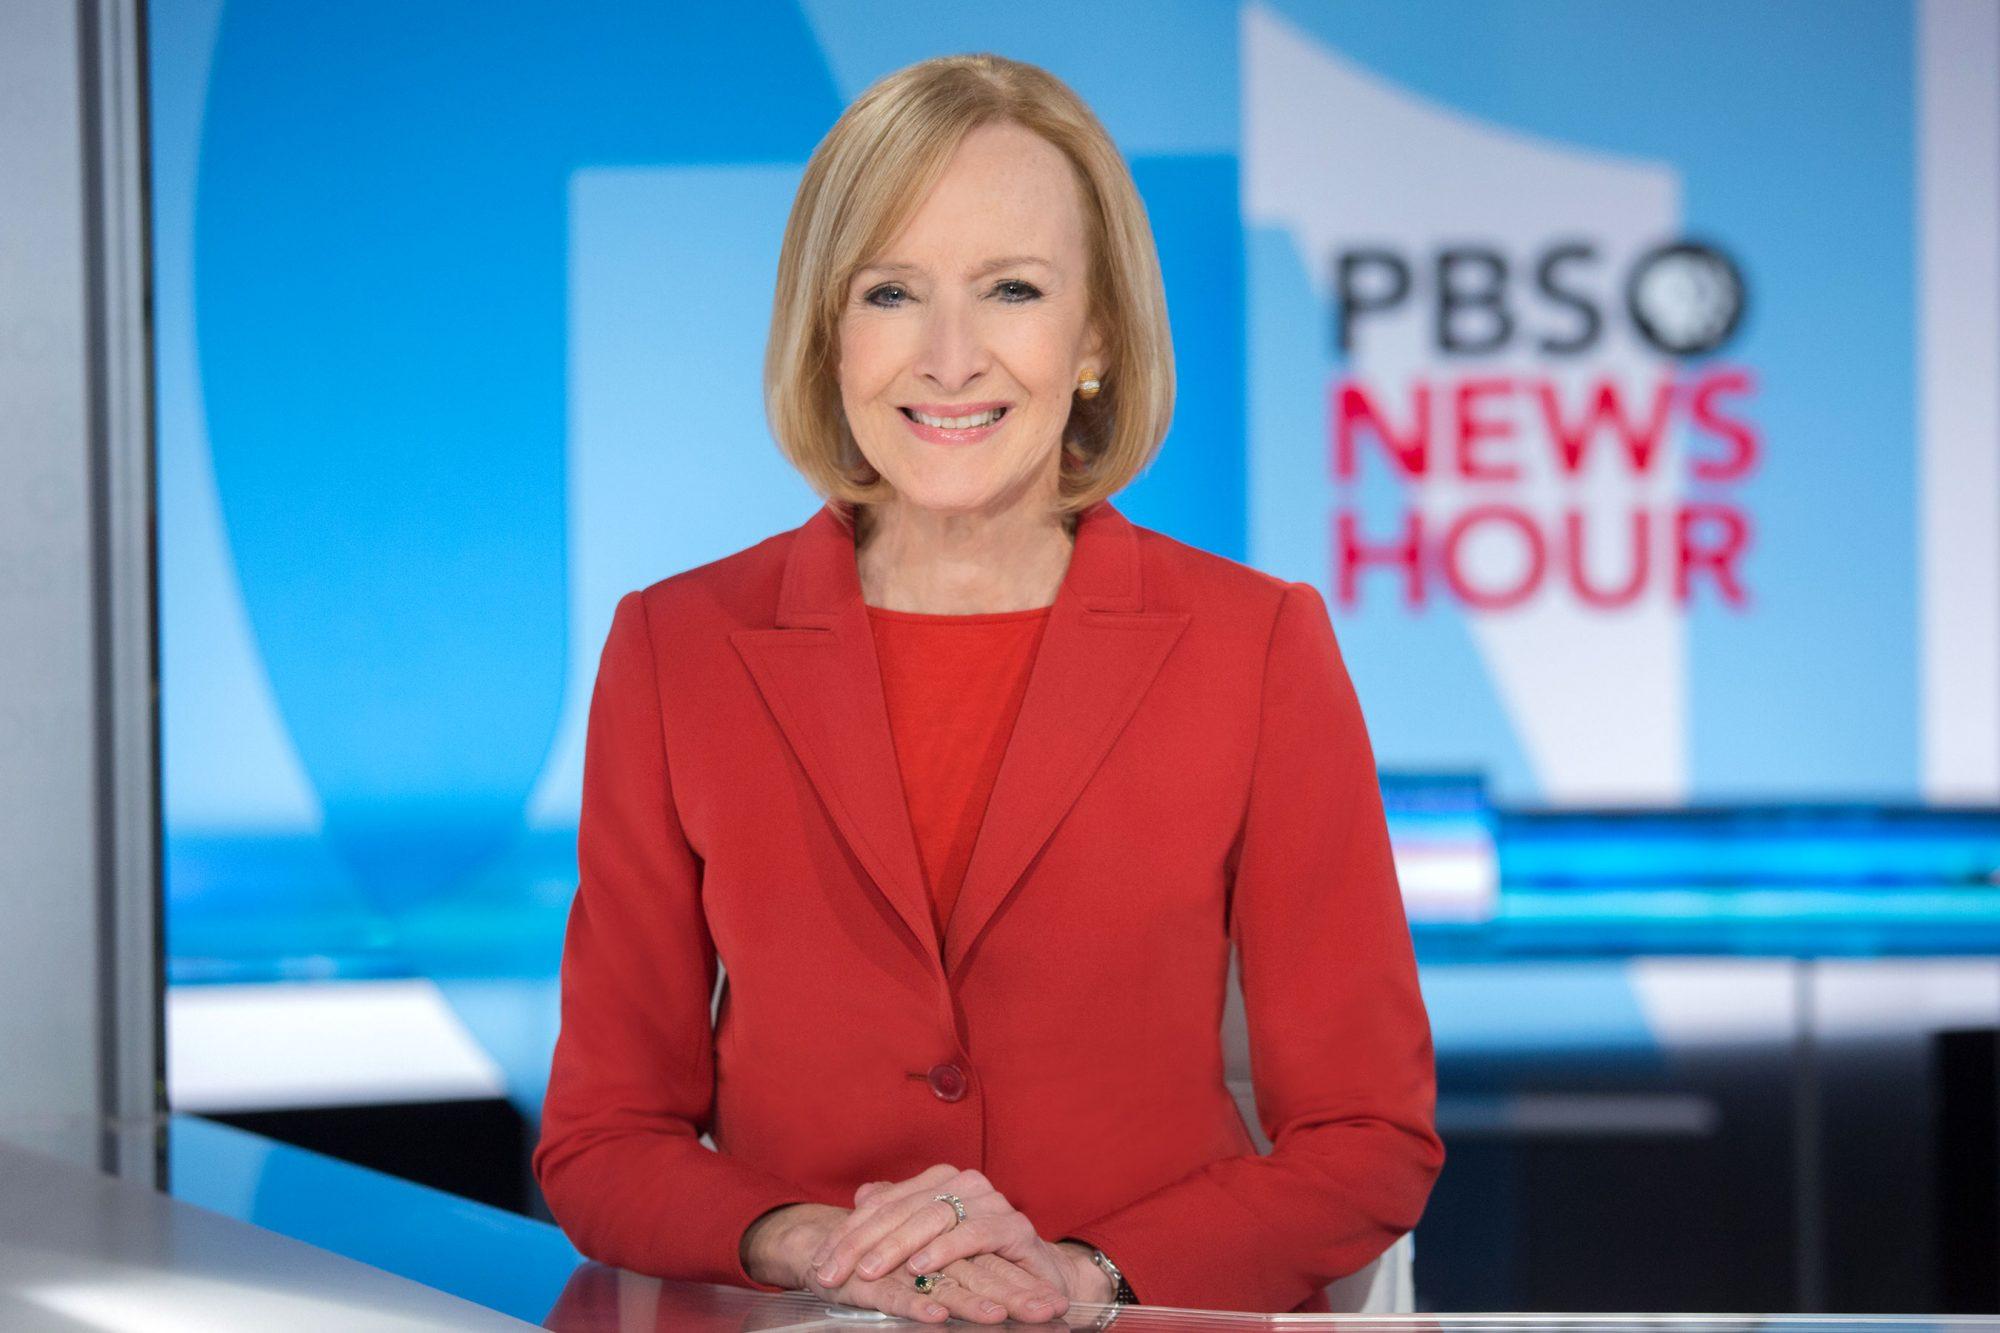 PBSNewsHour_JW